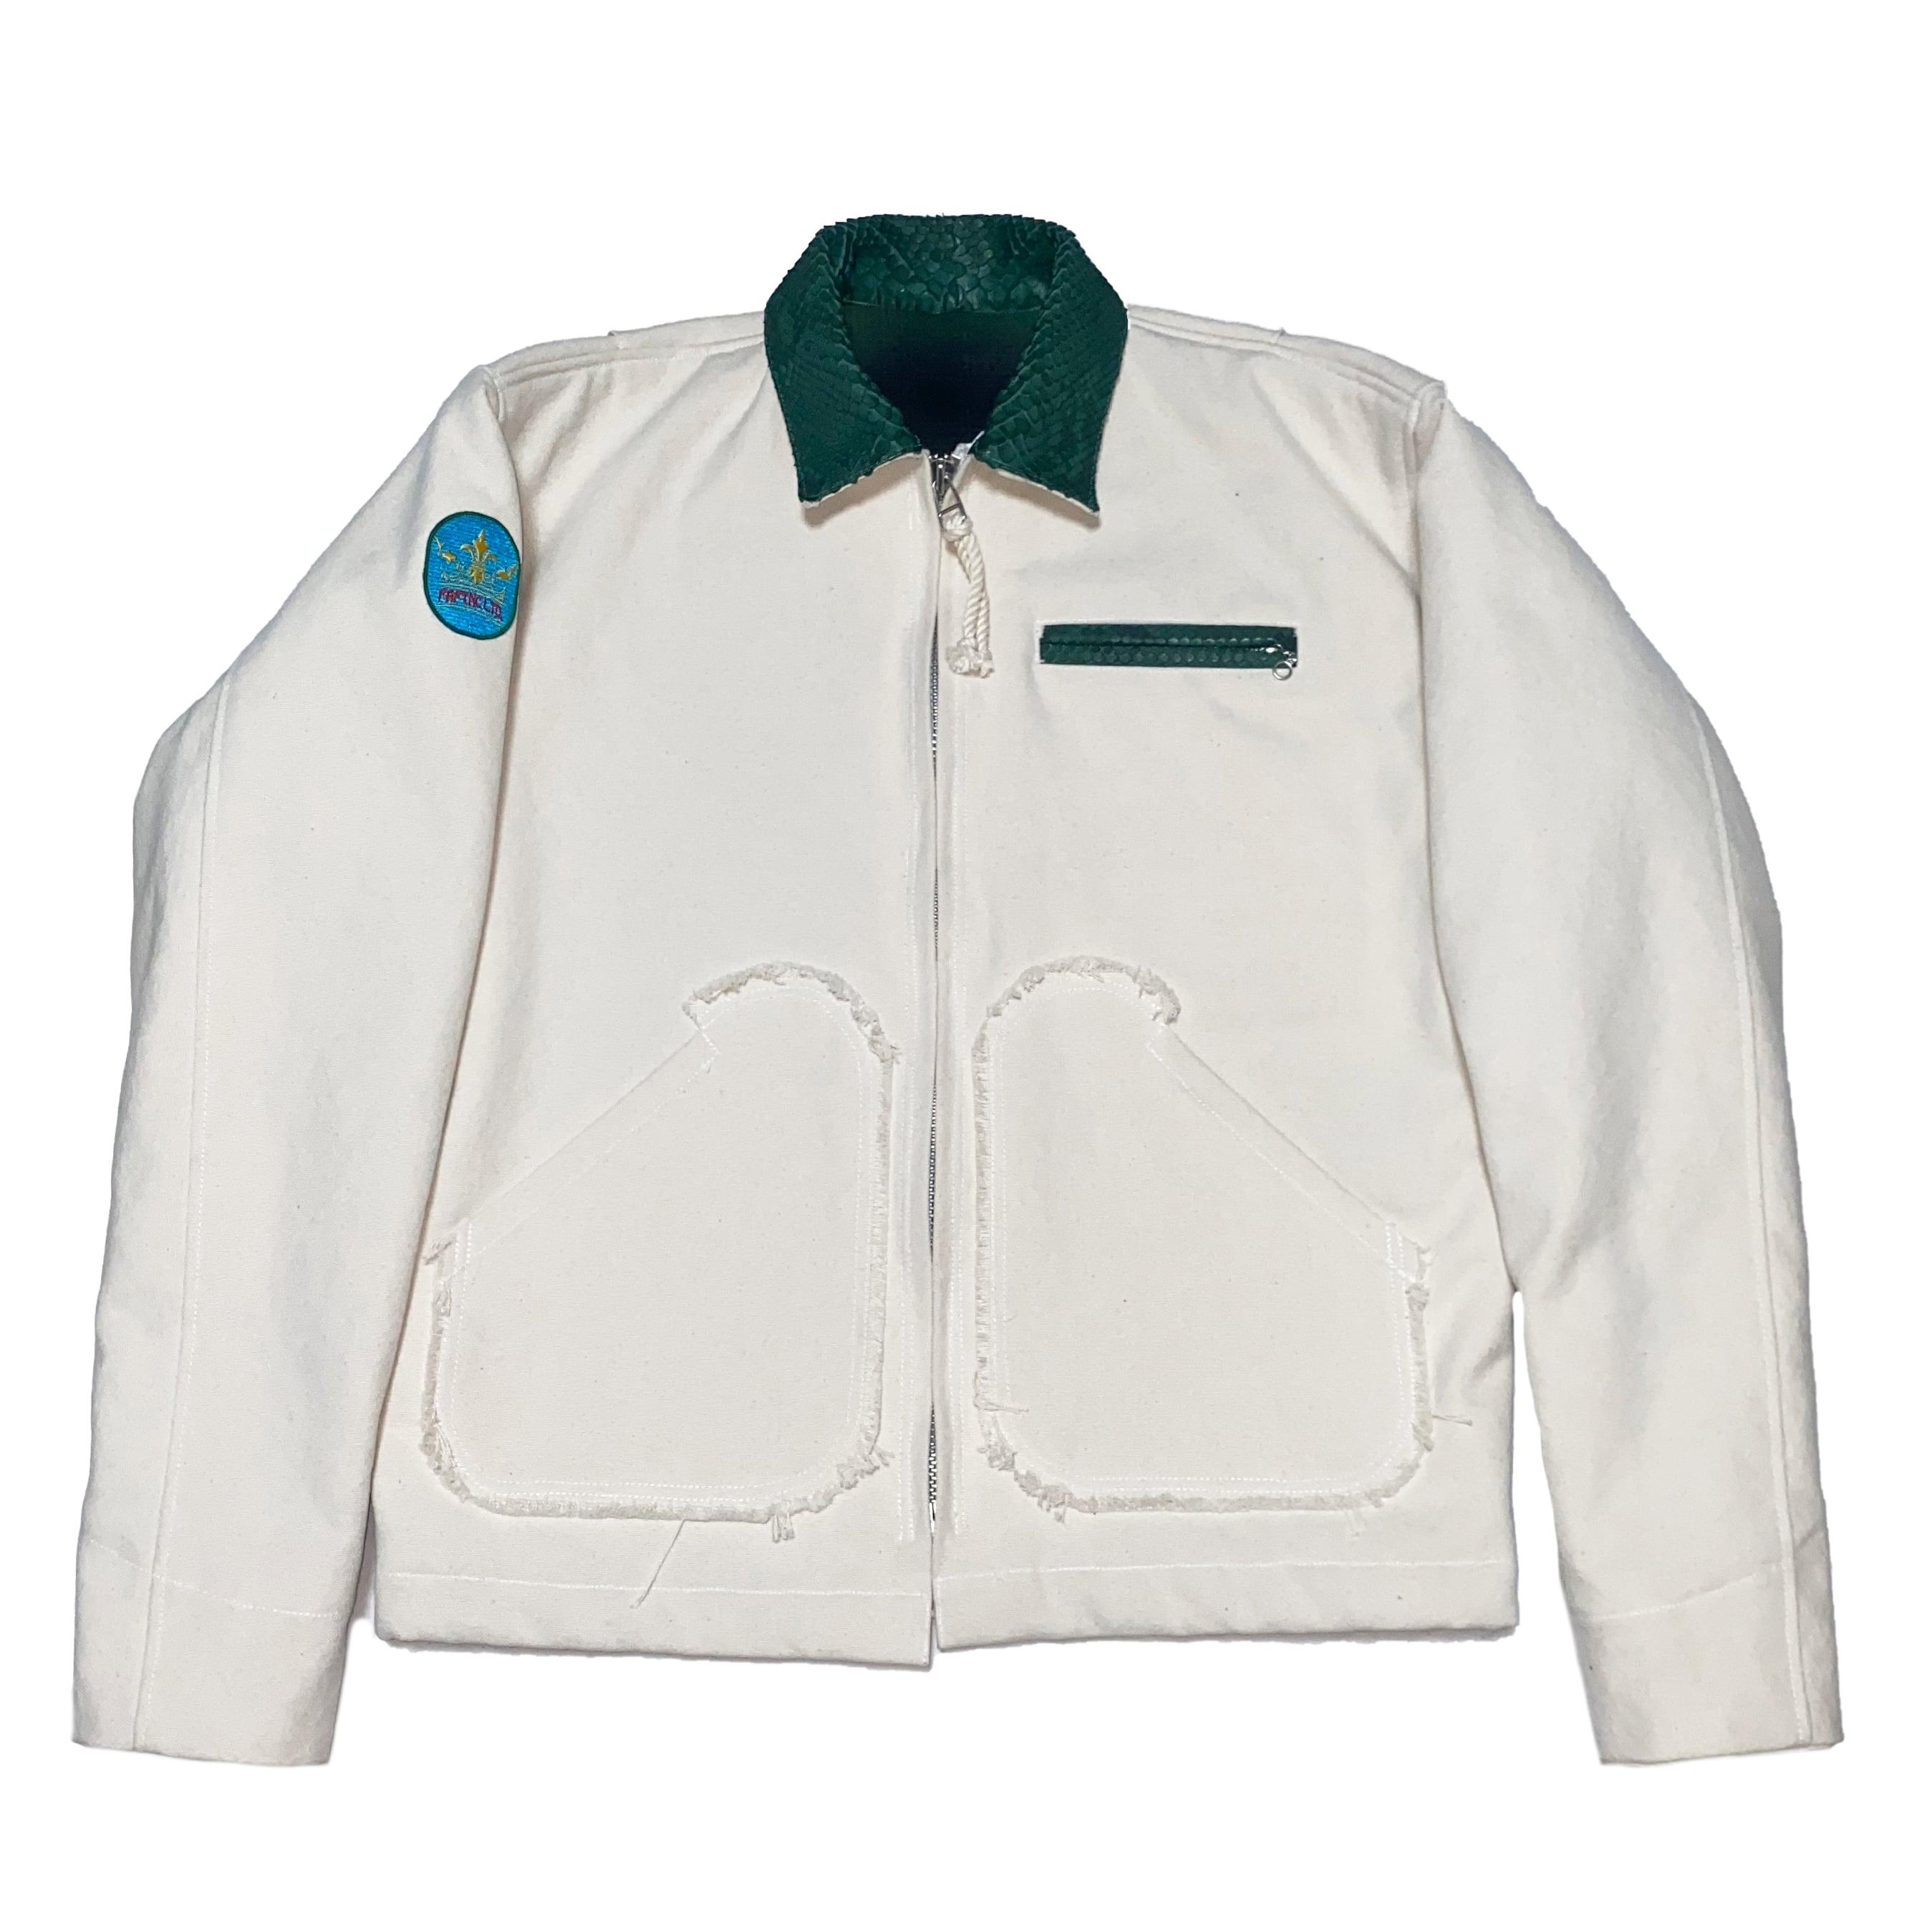 Petroit Work Jacket / White - 画像1